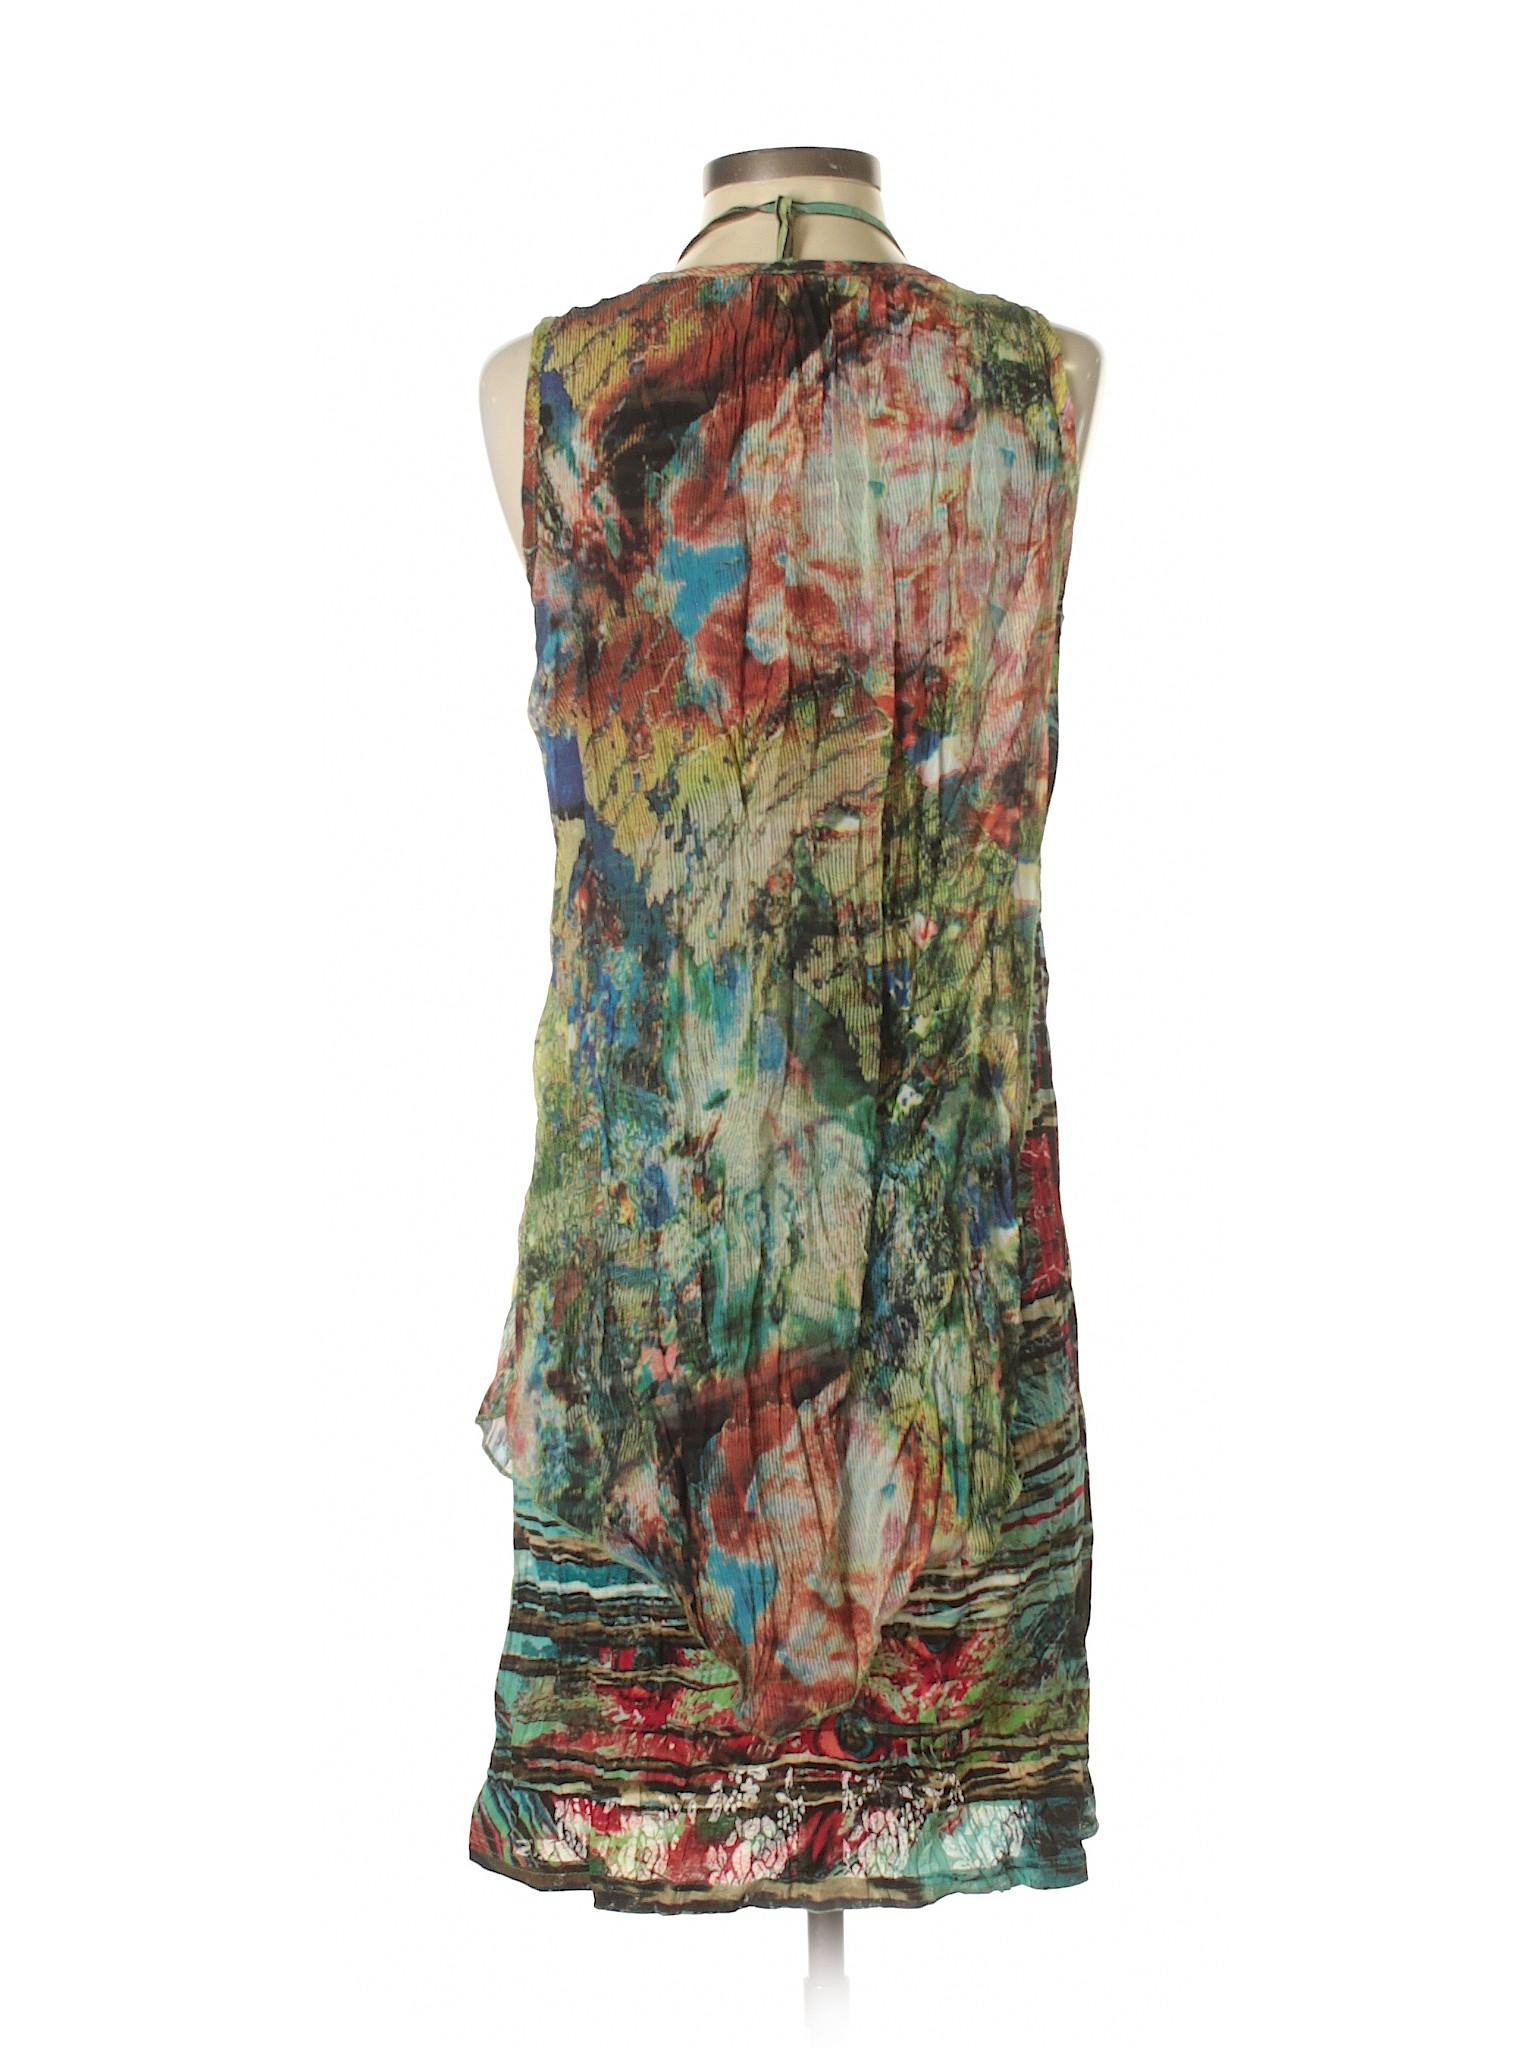 Dress Selling Selling Klozlyne Klozlyne Casual qzFIzwHxR